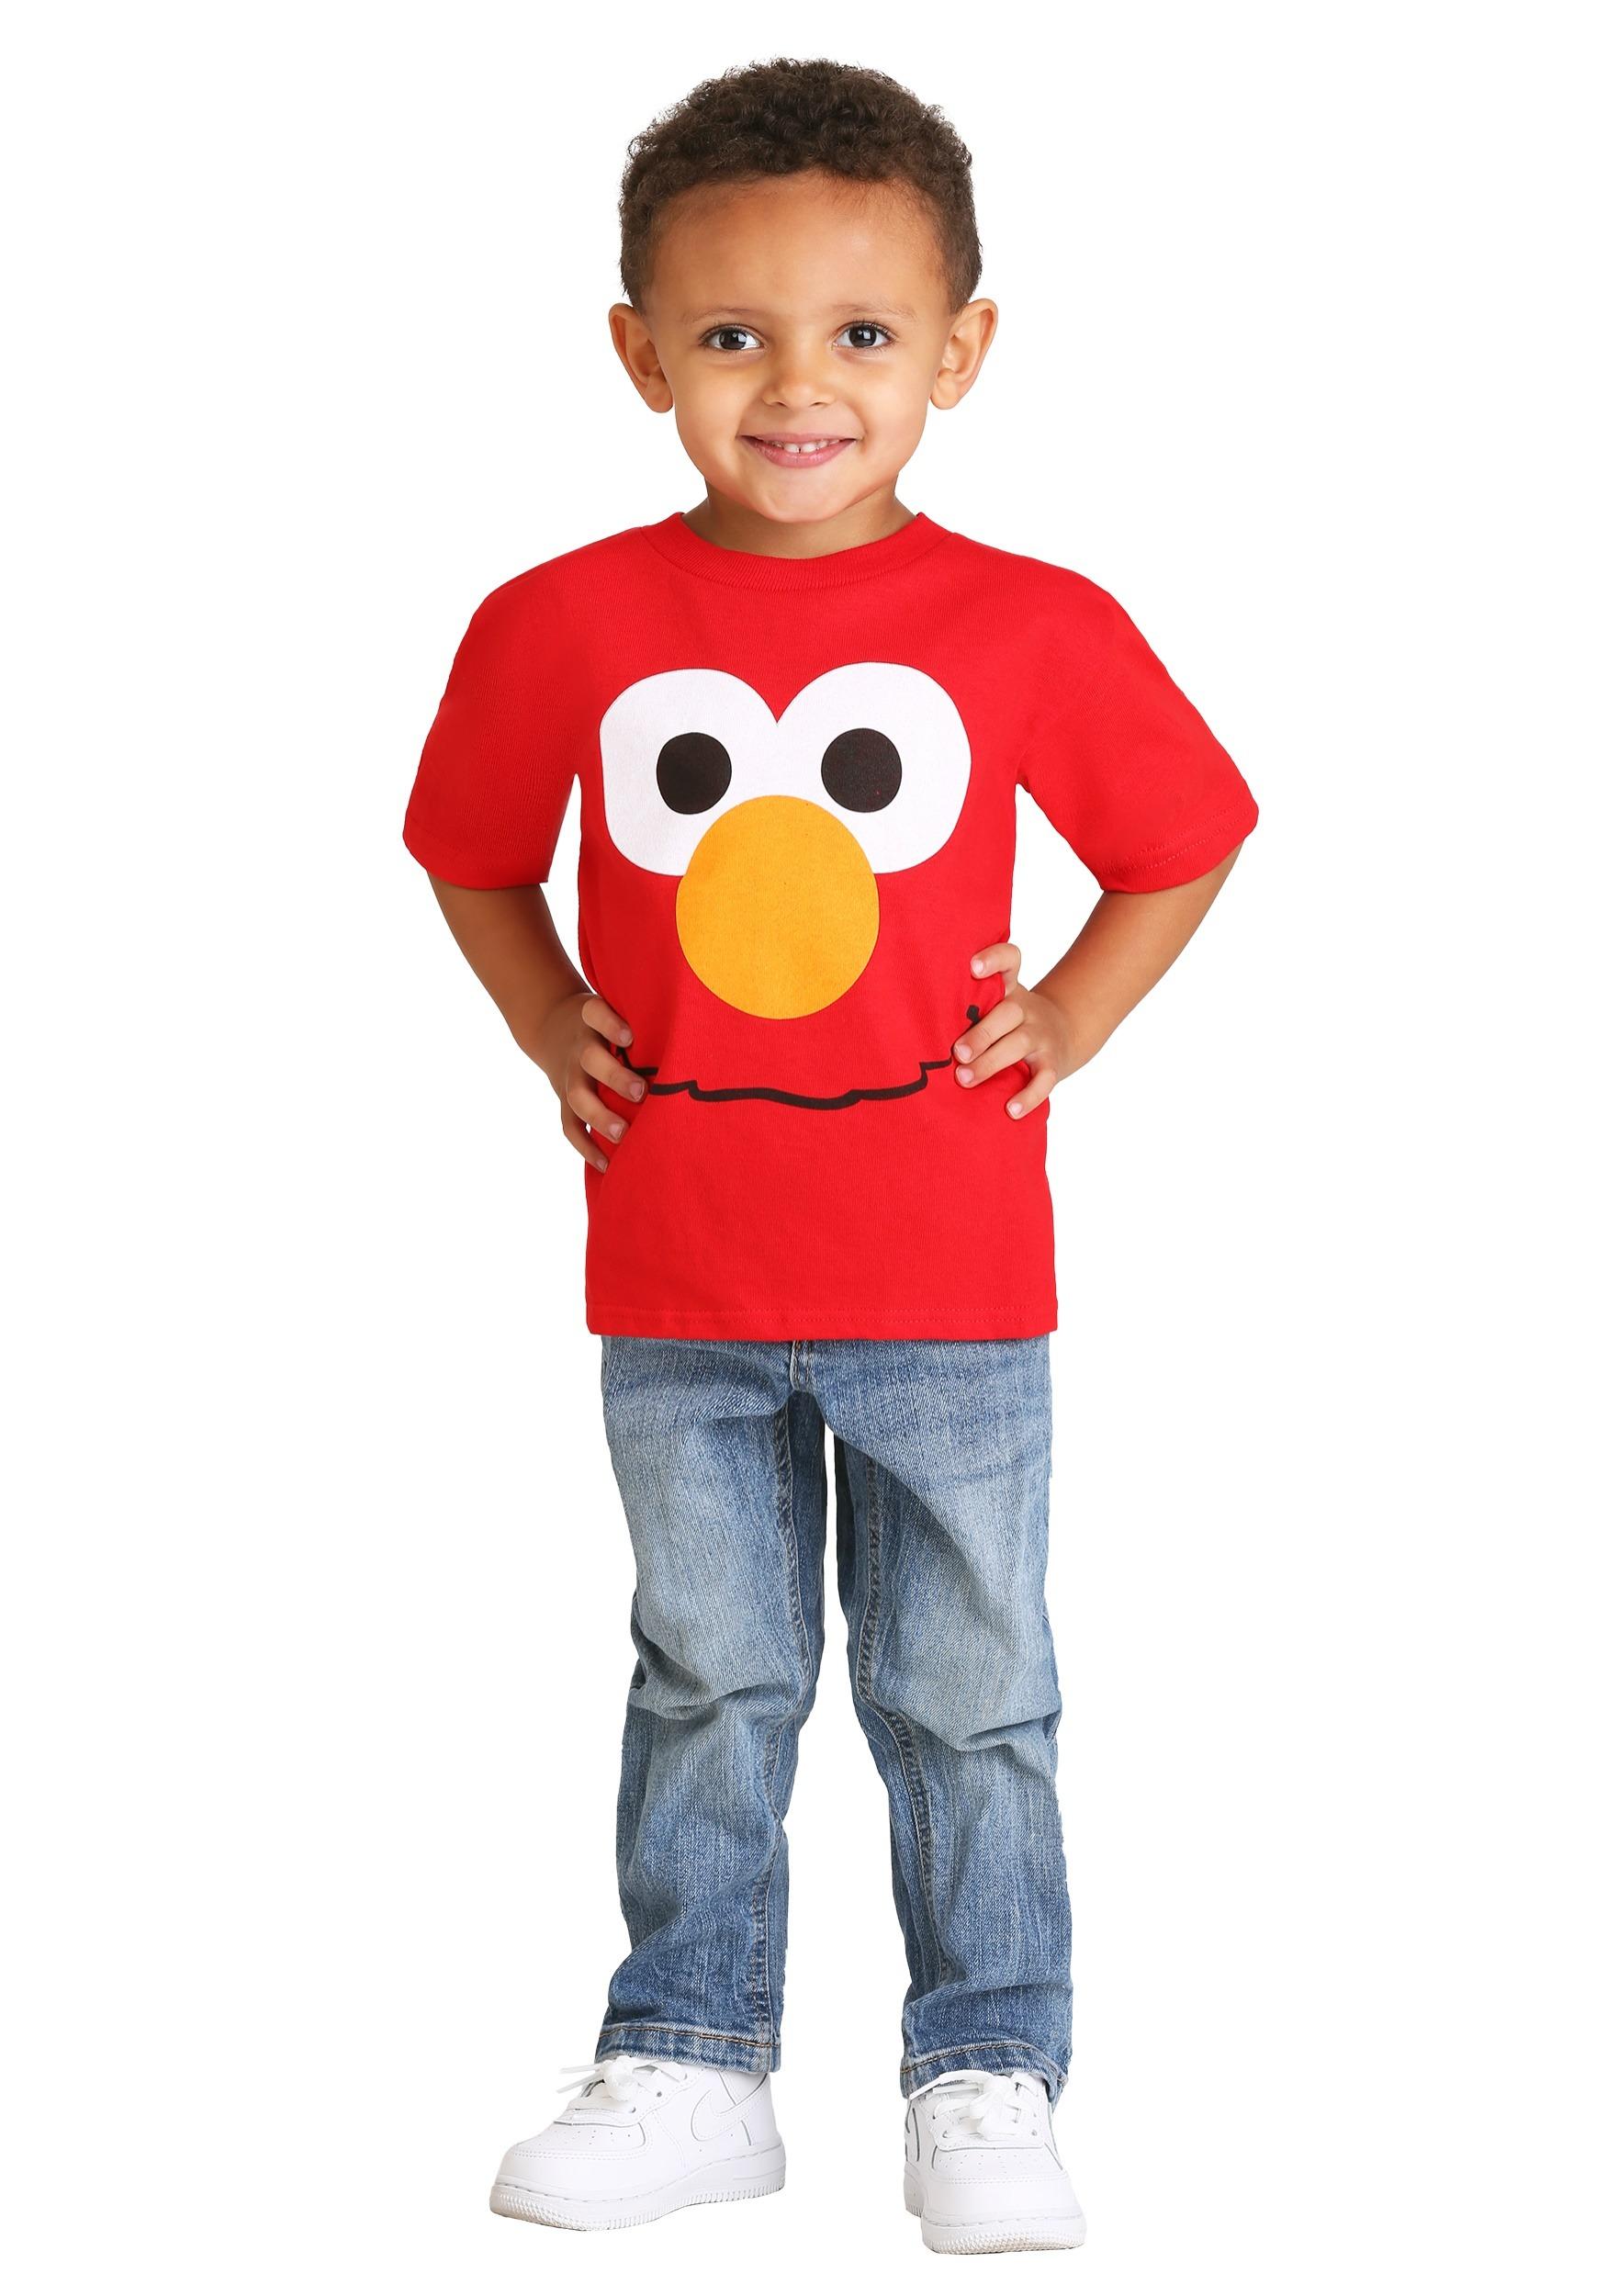 Toddler Boys Elmo Big Face Costume Tee